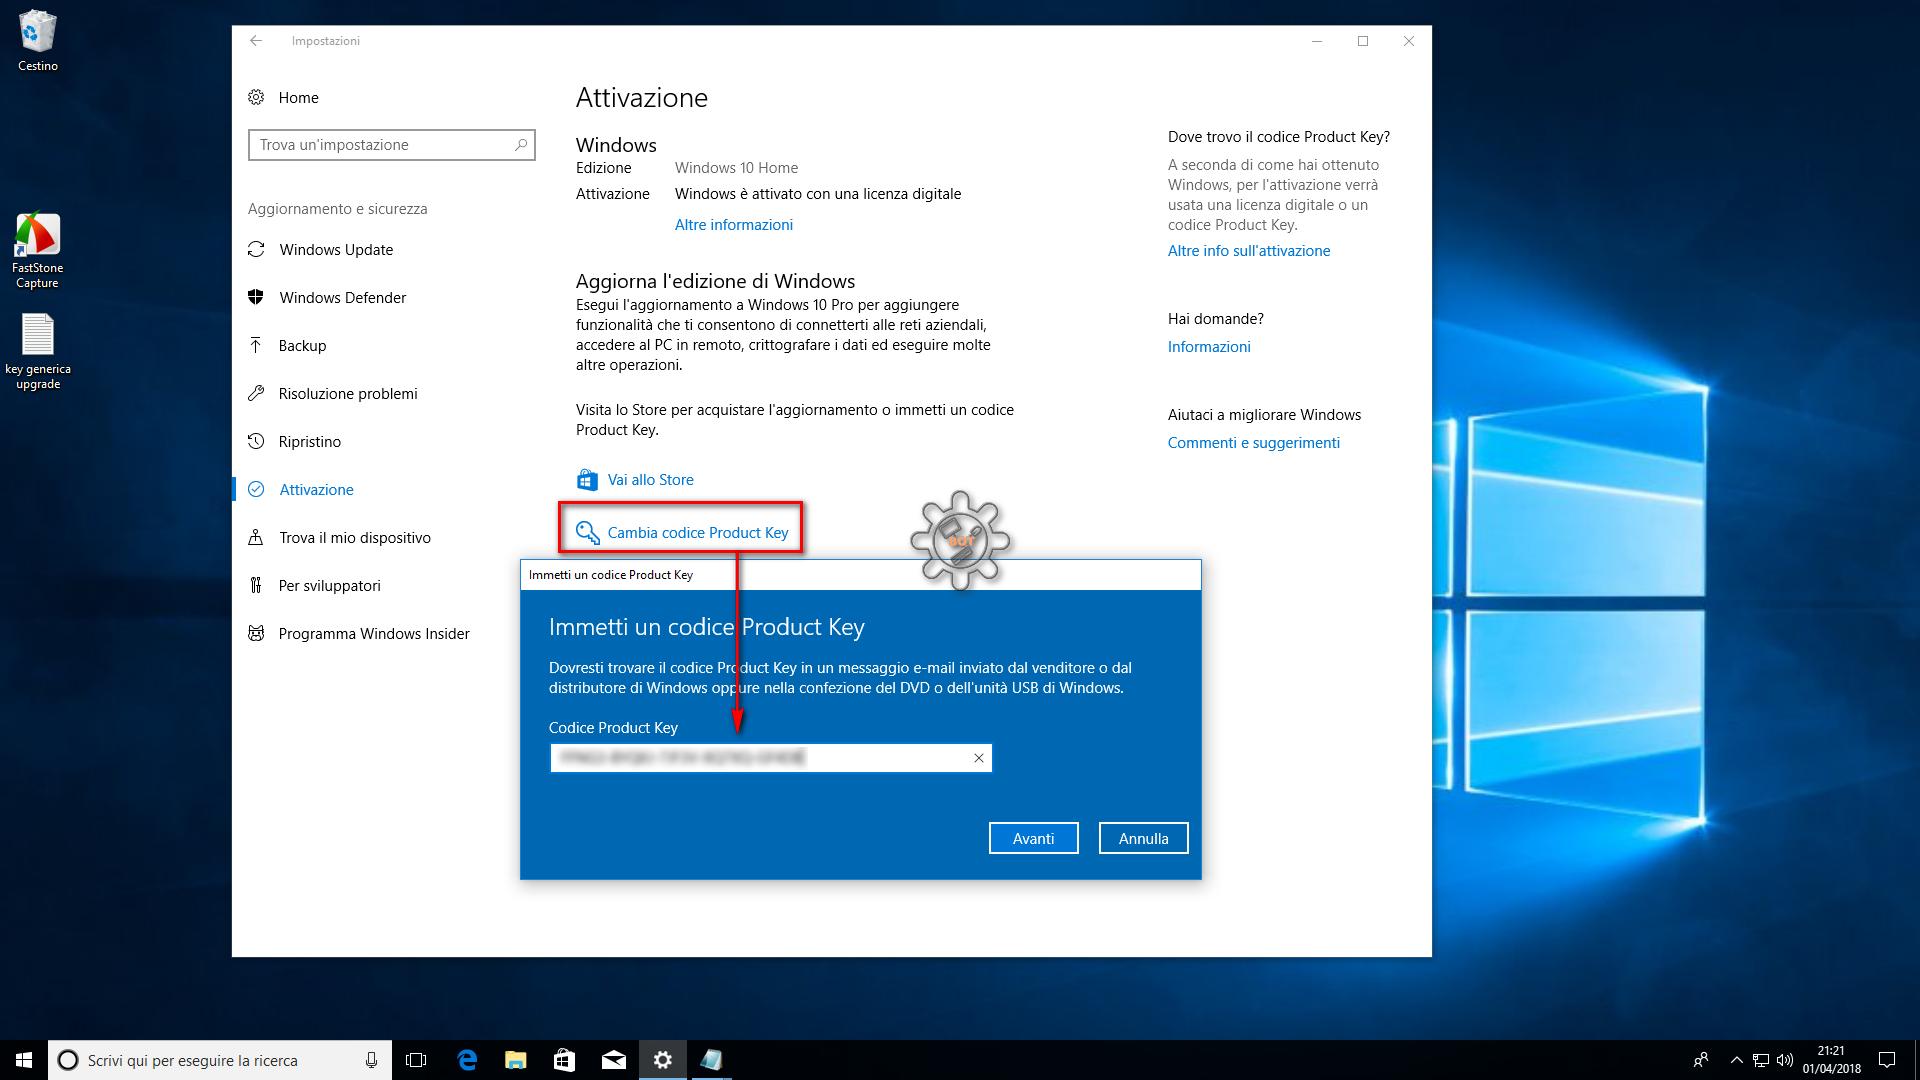 windows 10 home product key free 2018